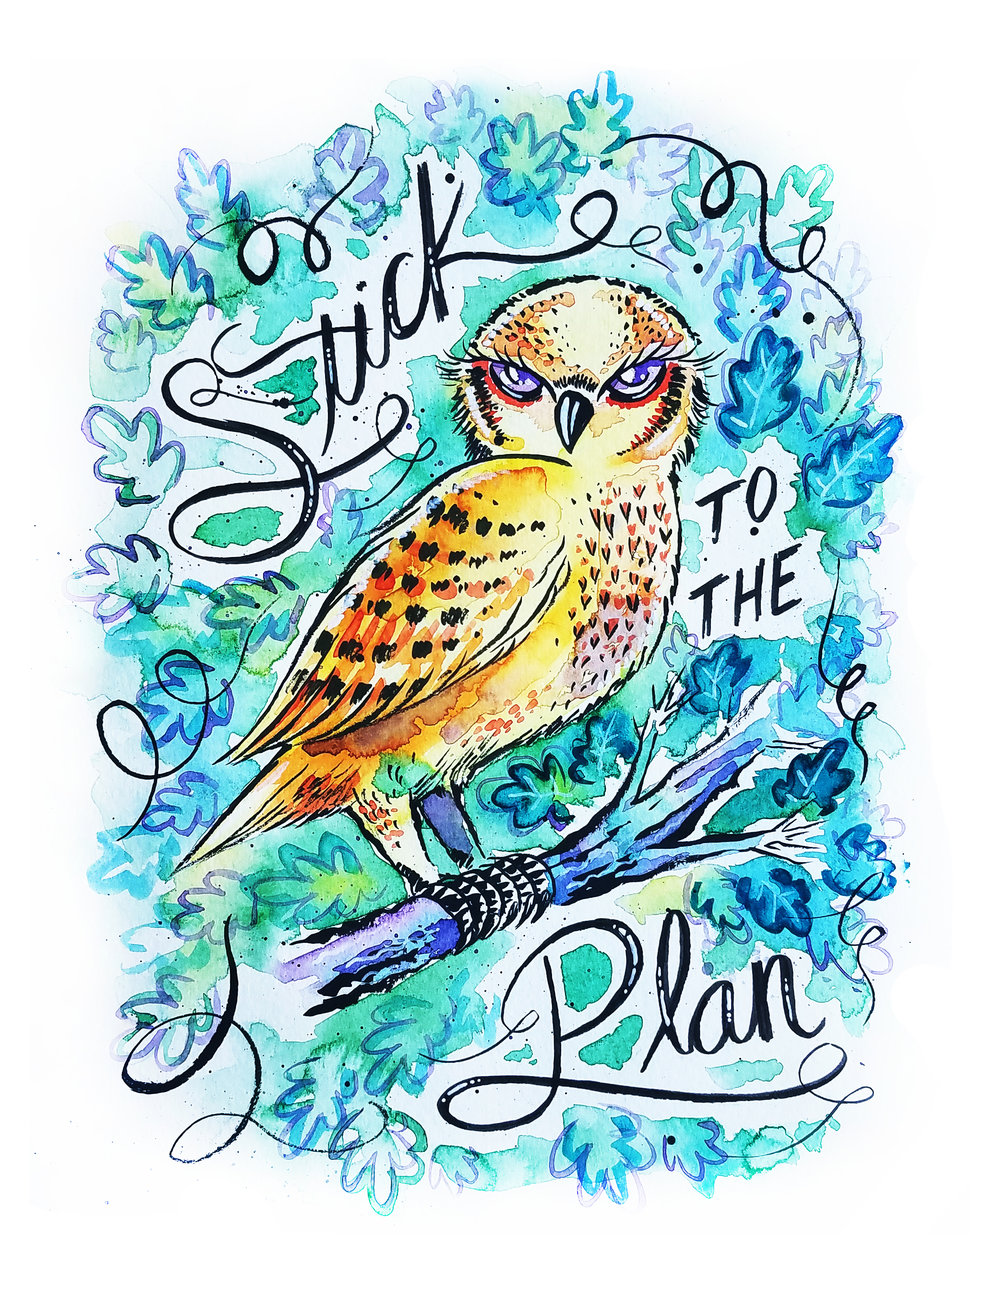 Stick to the plan 8.5x11.jpg